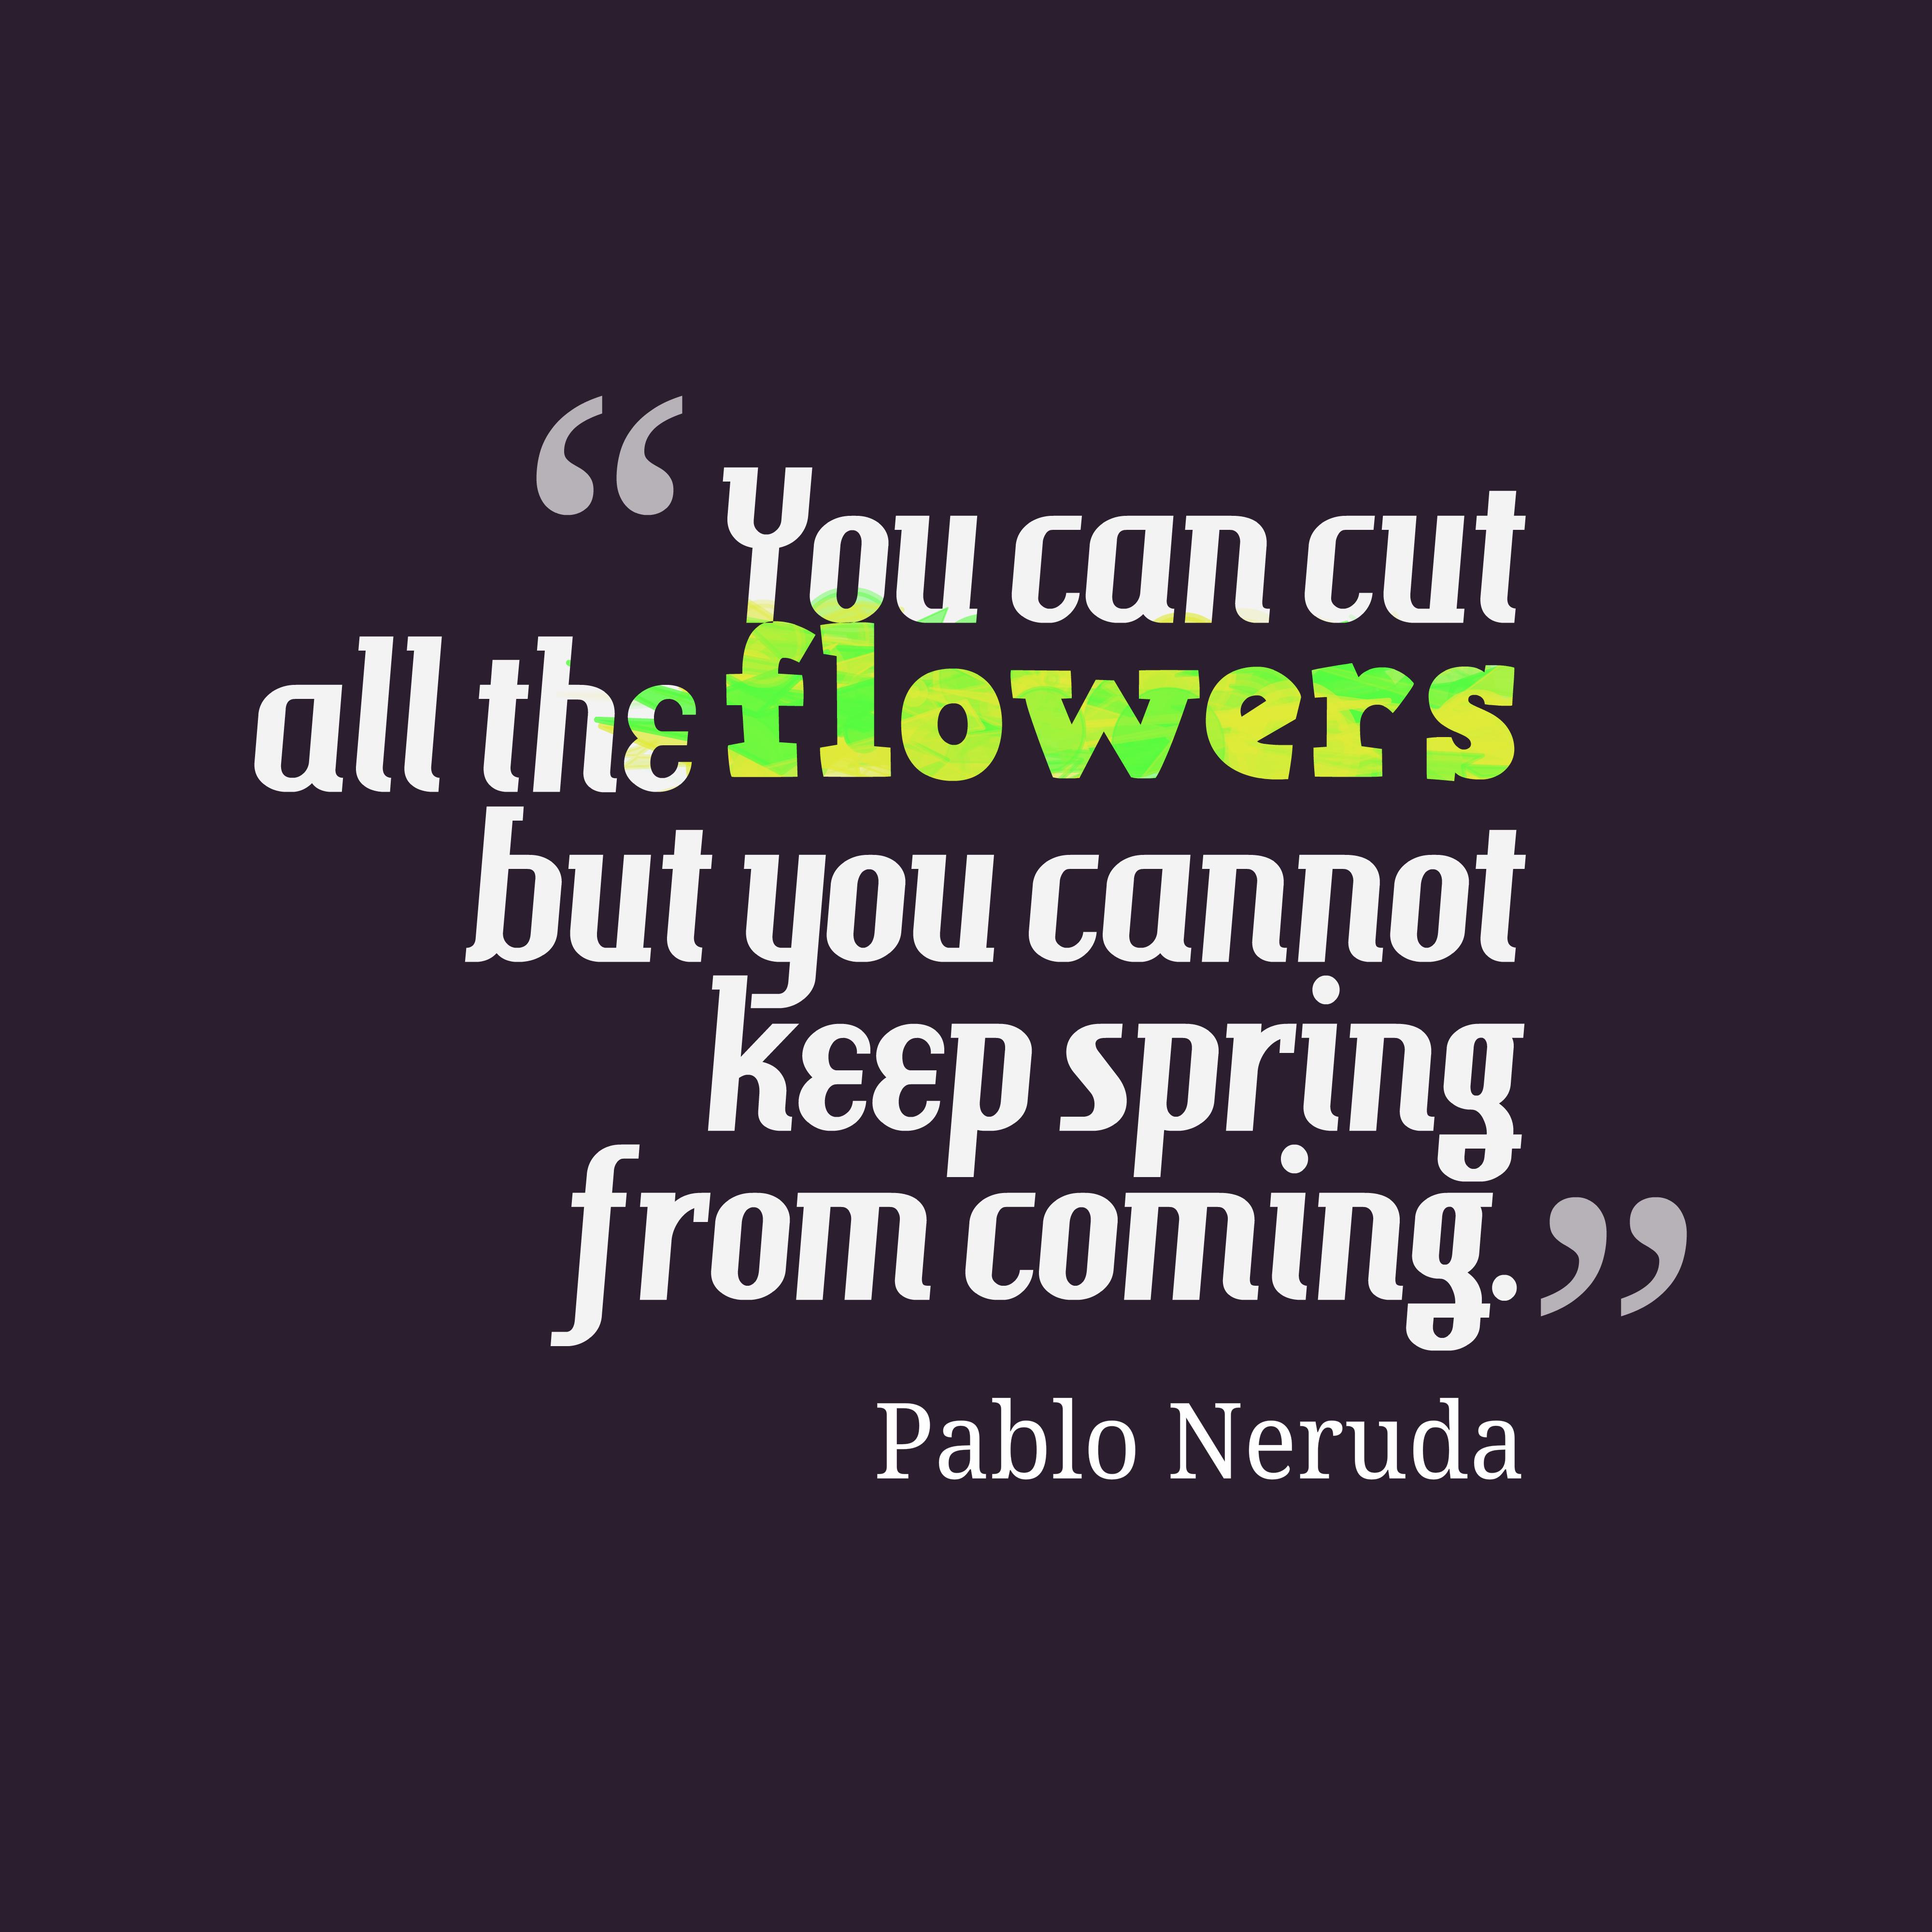 Pablo Neruda Quote About Gardening